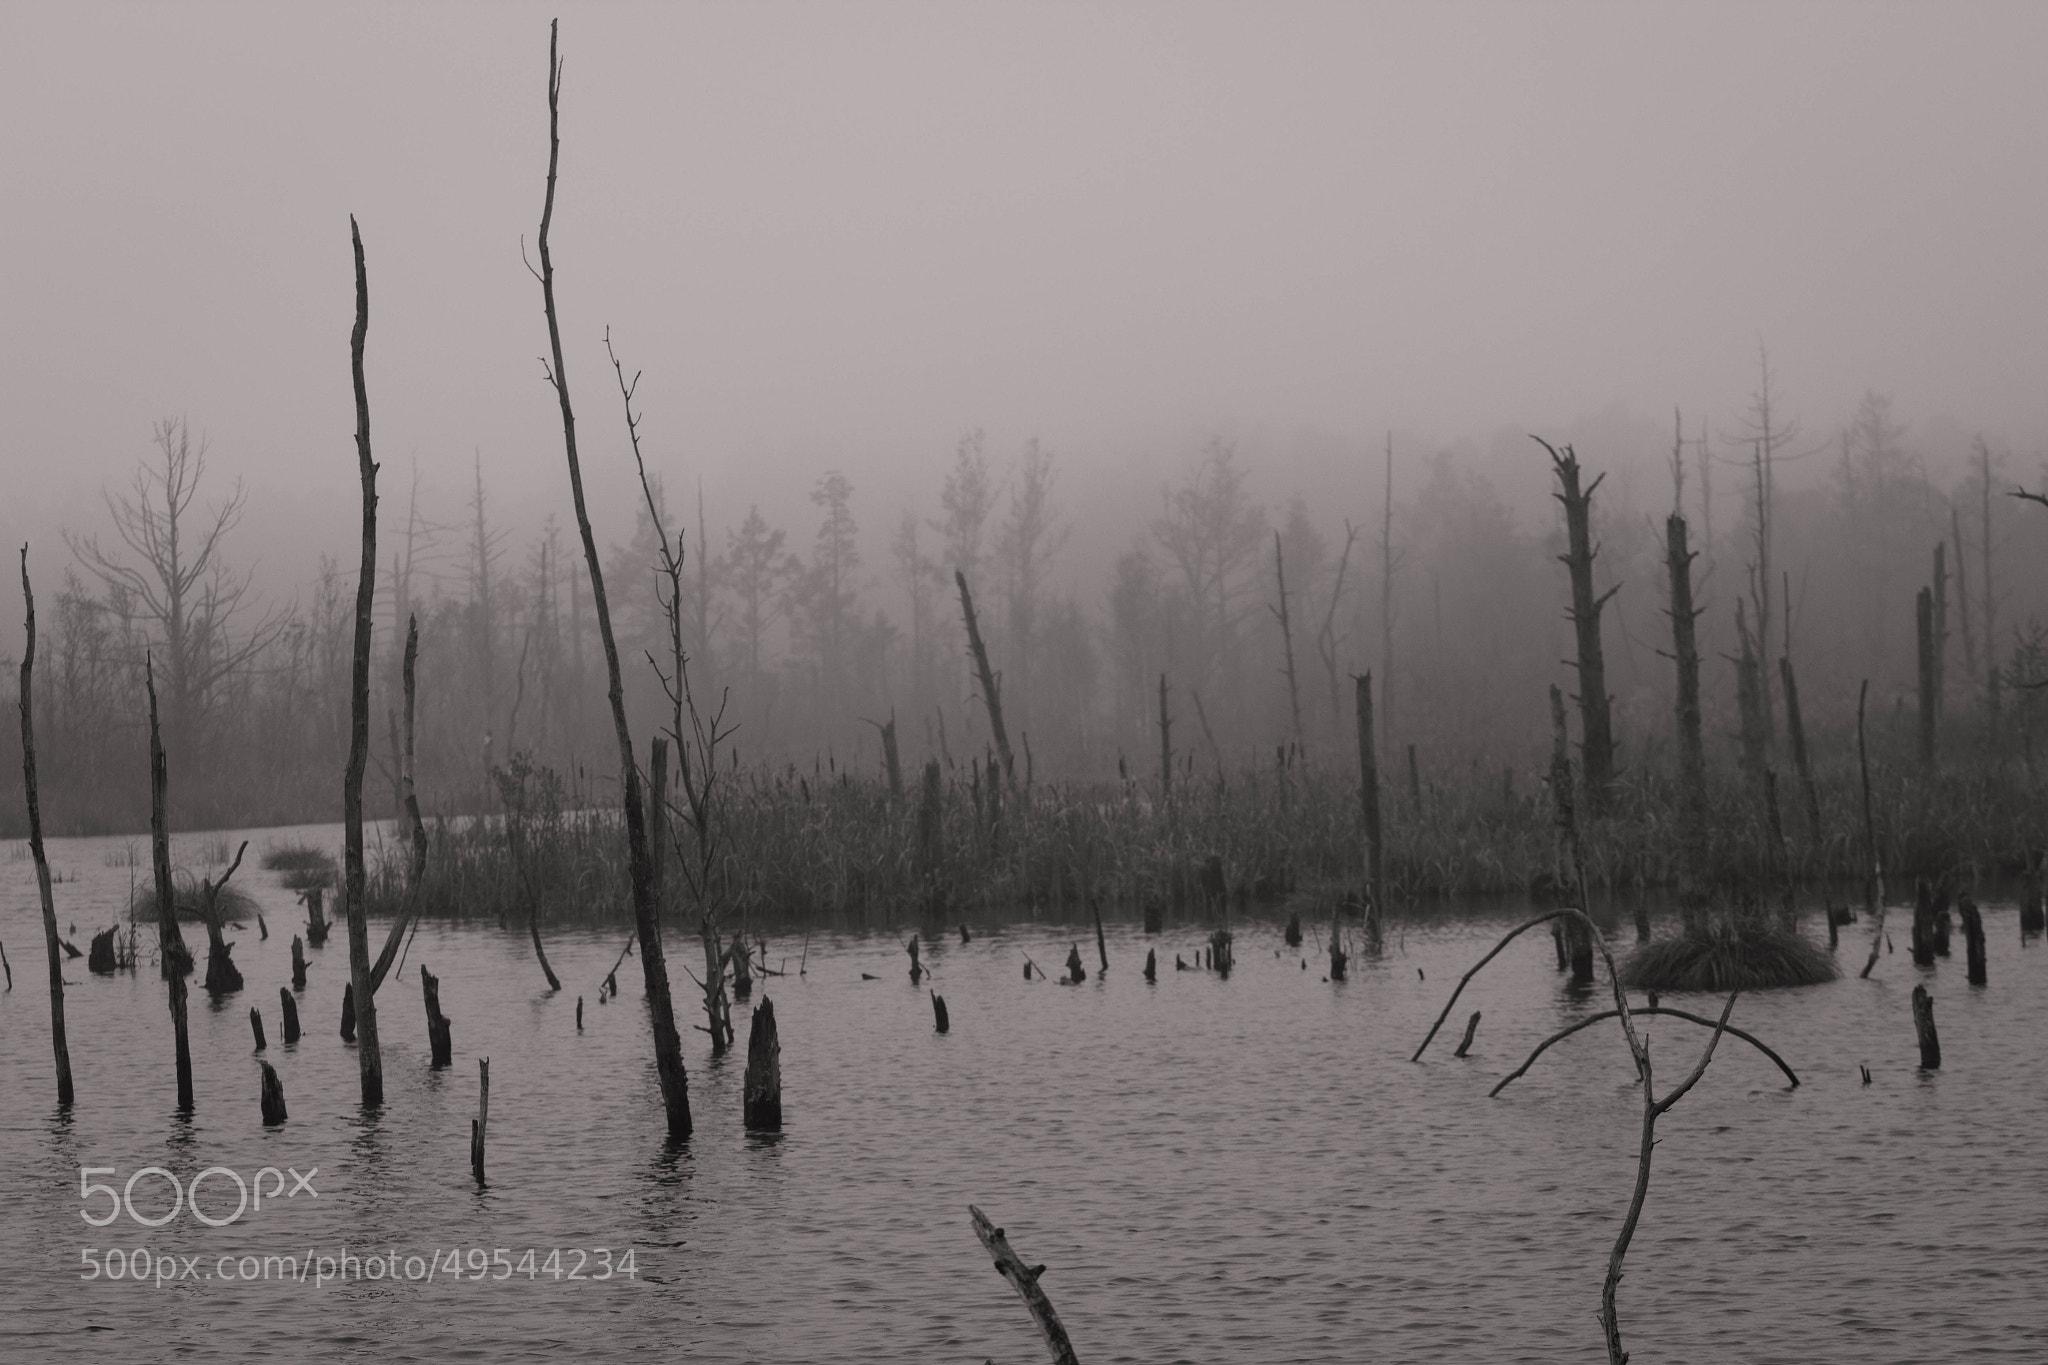 Photograph Moss in Schwenningen Germany by Heike Kitzig on 500px